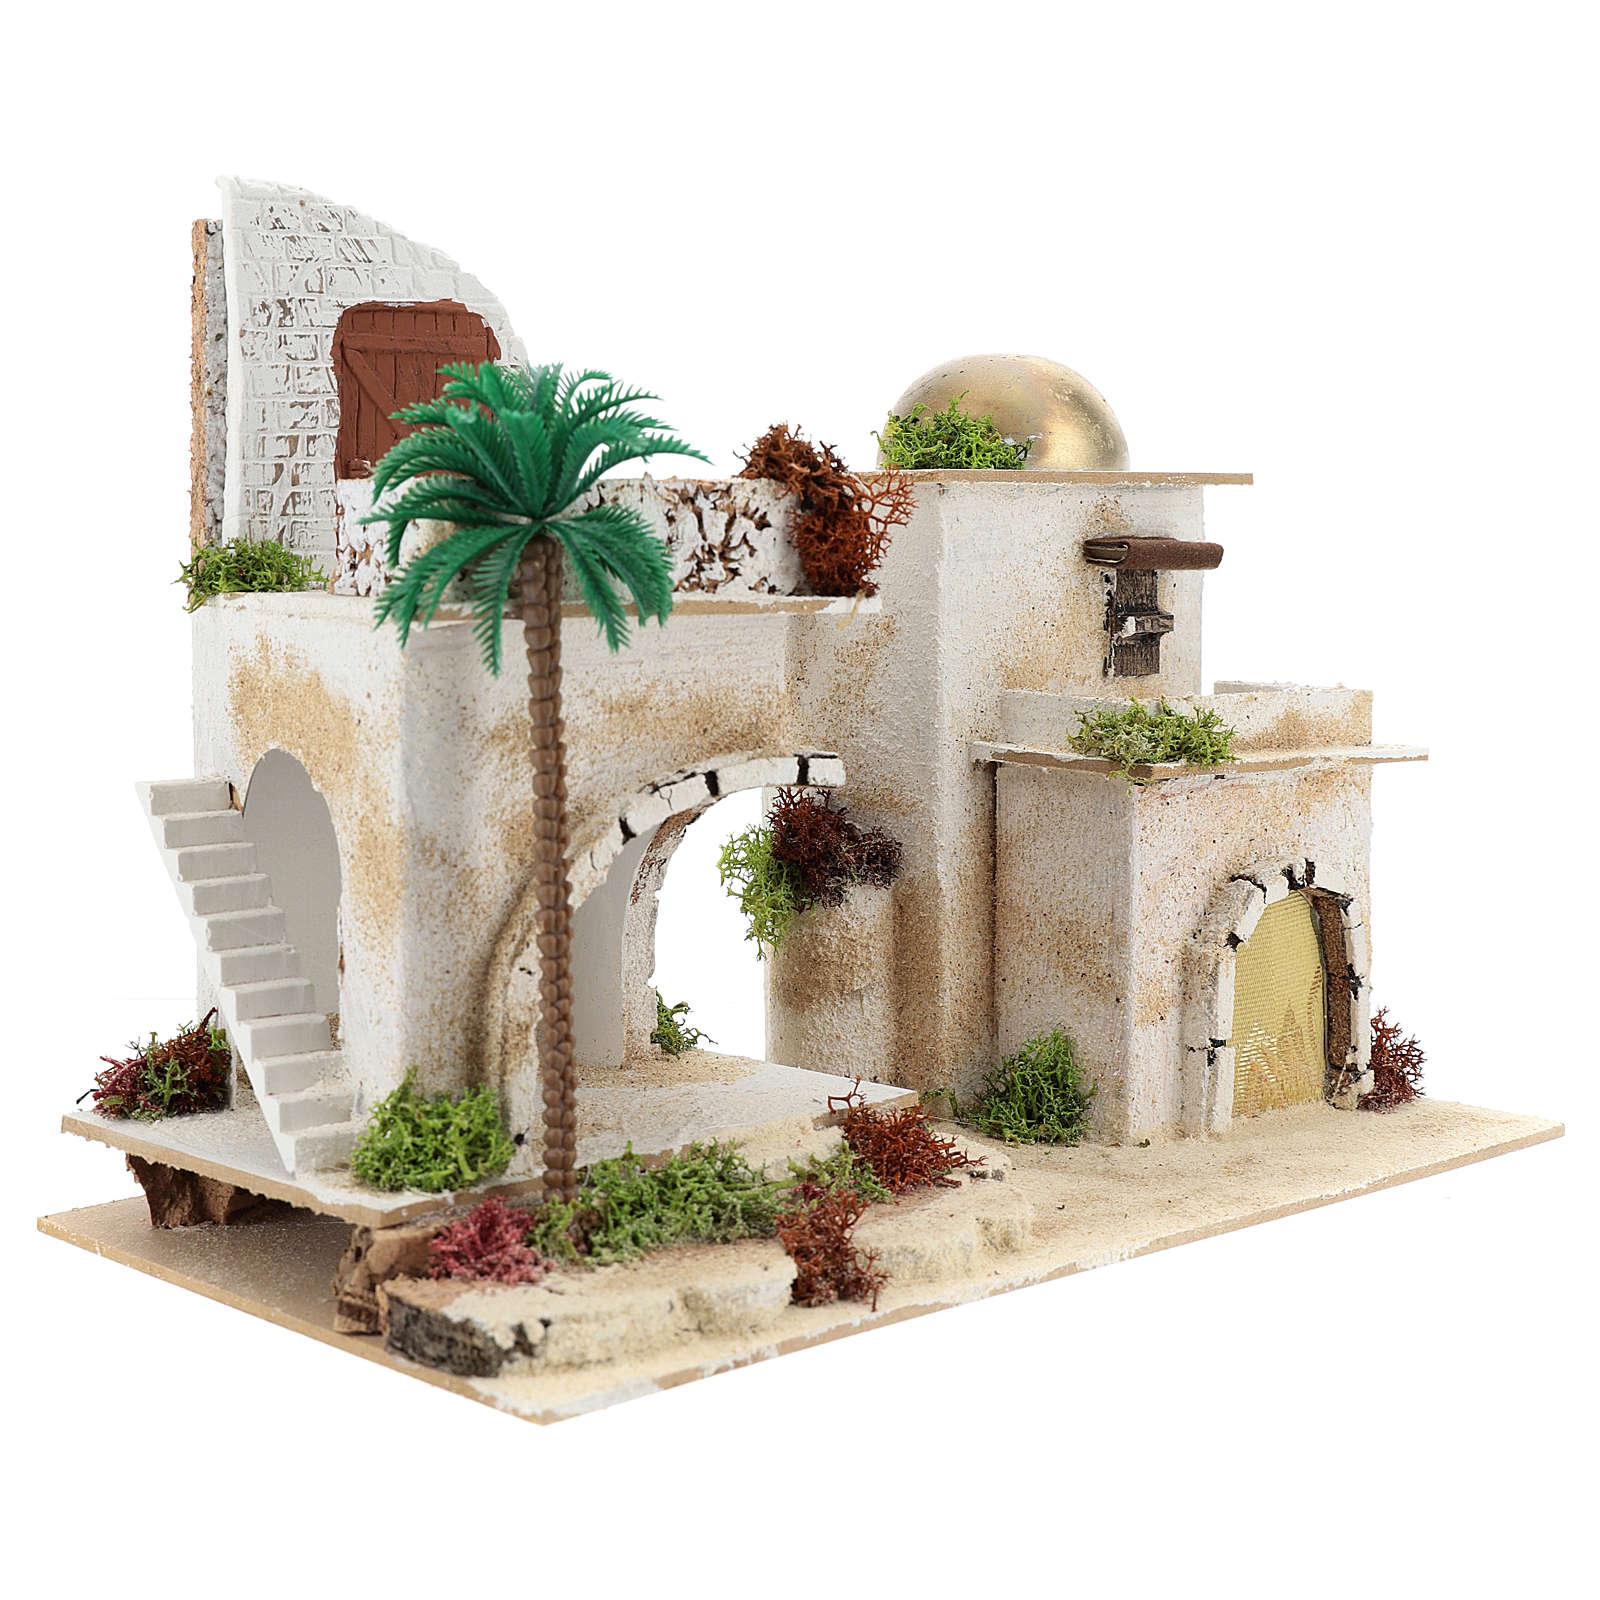 Arab House with Balcony for Nativity 25X35X20 cm 4